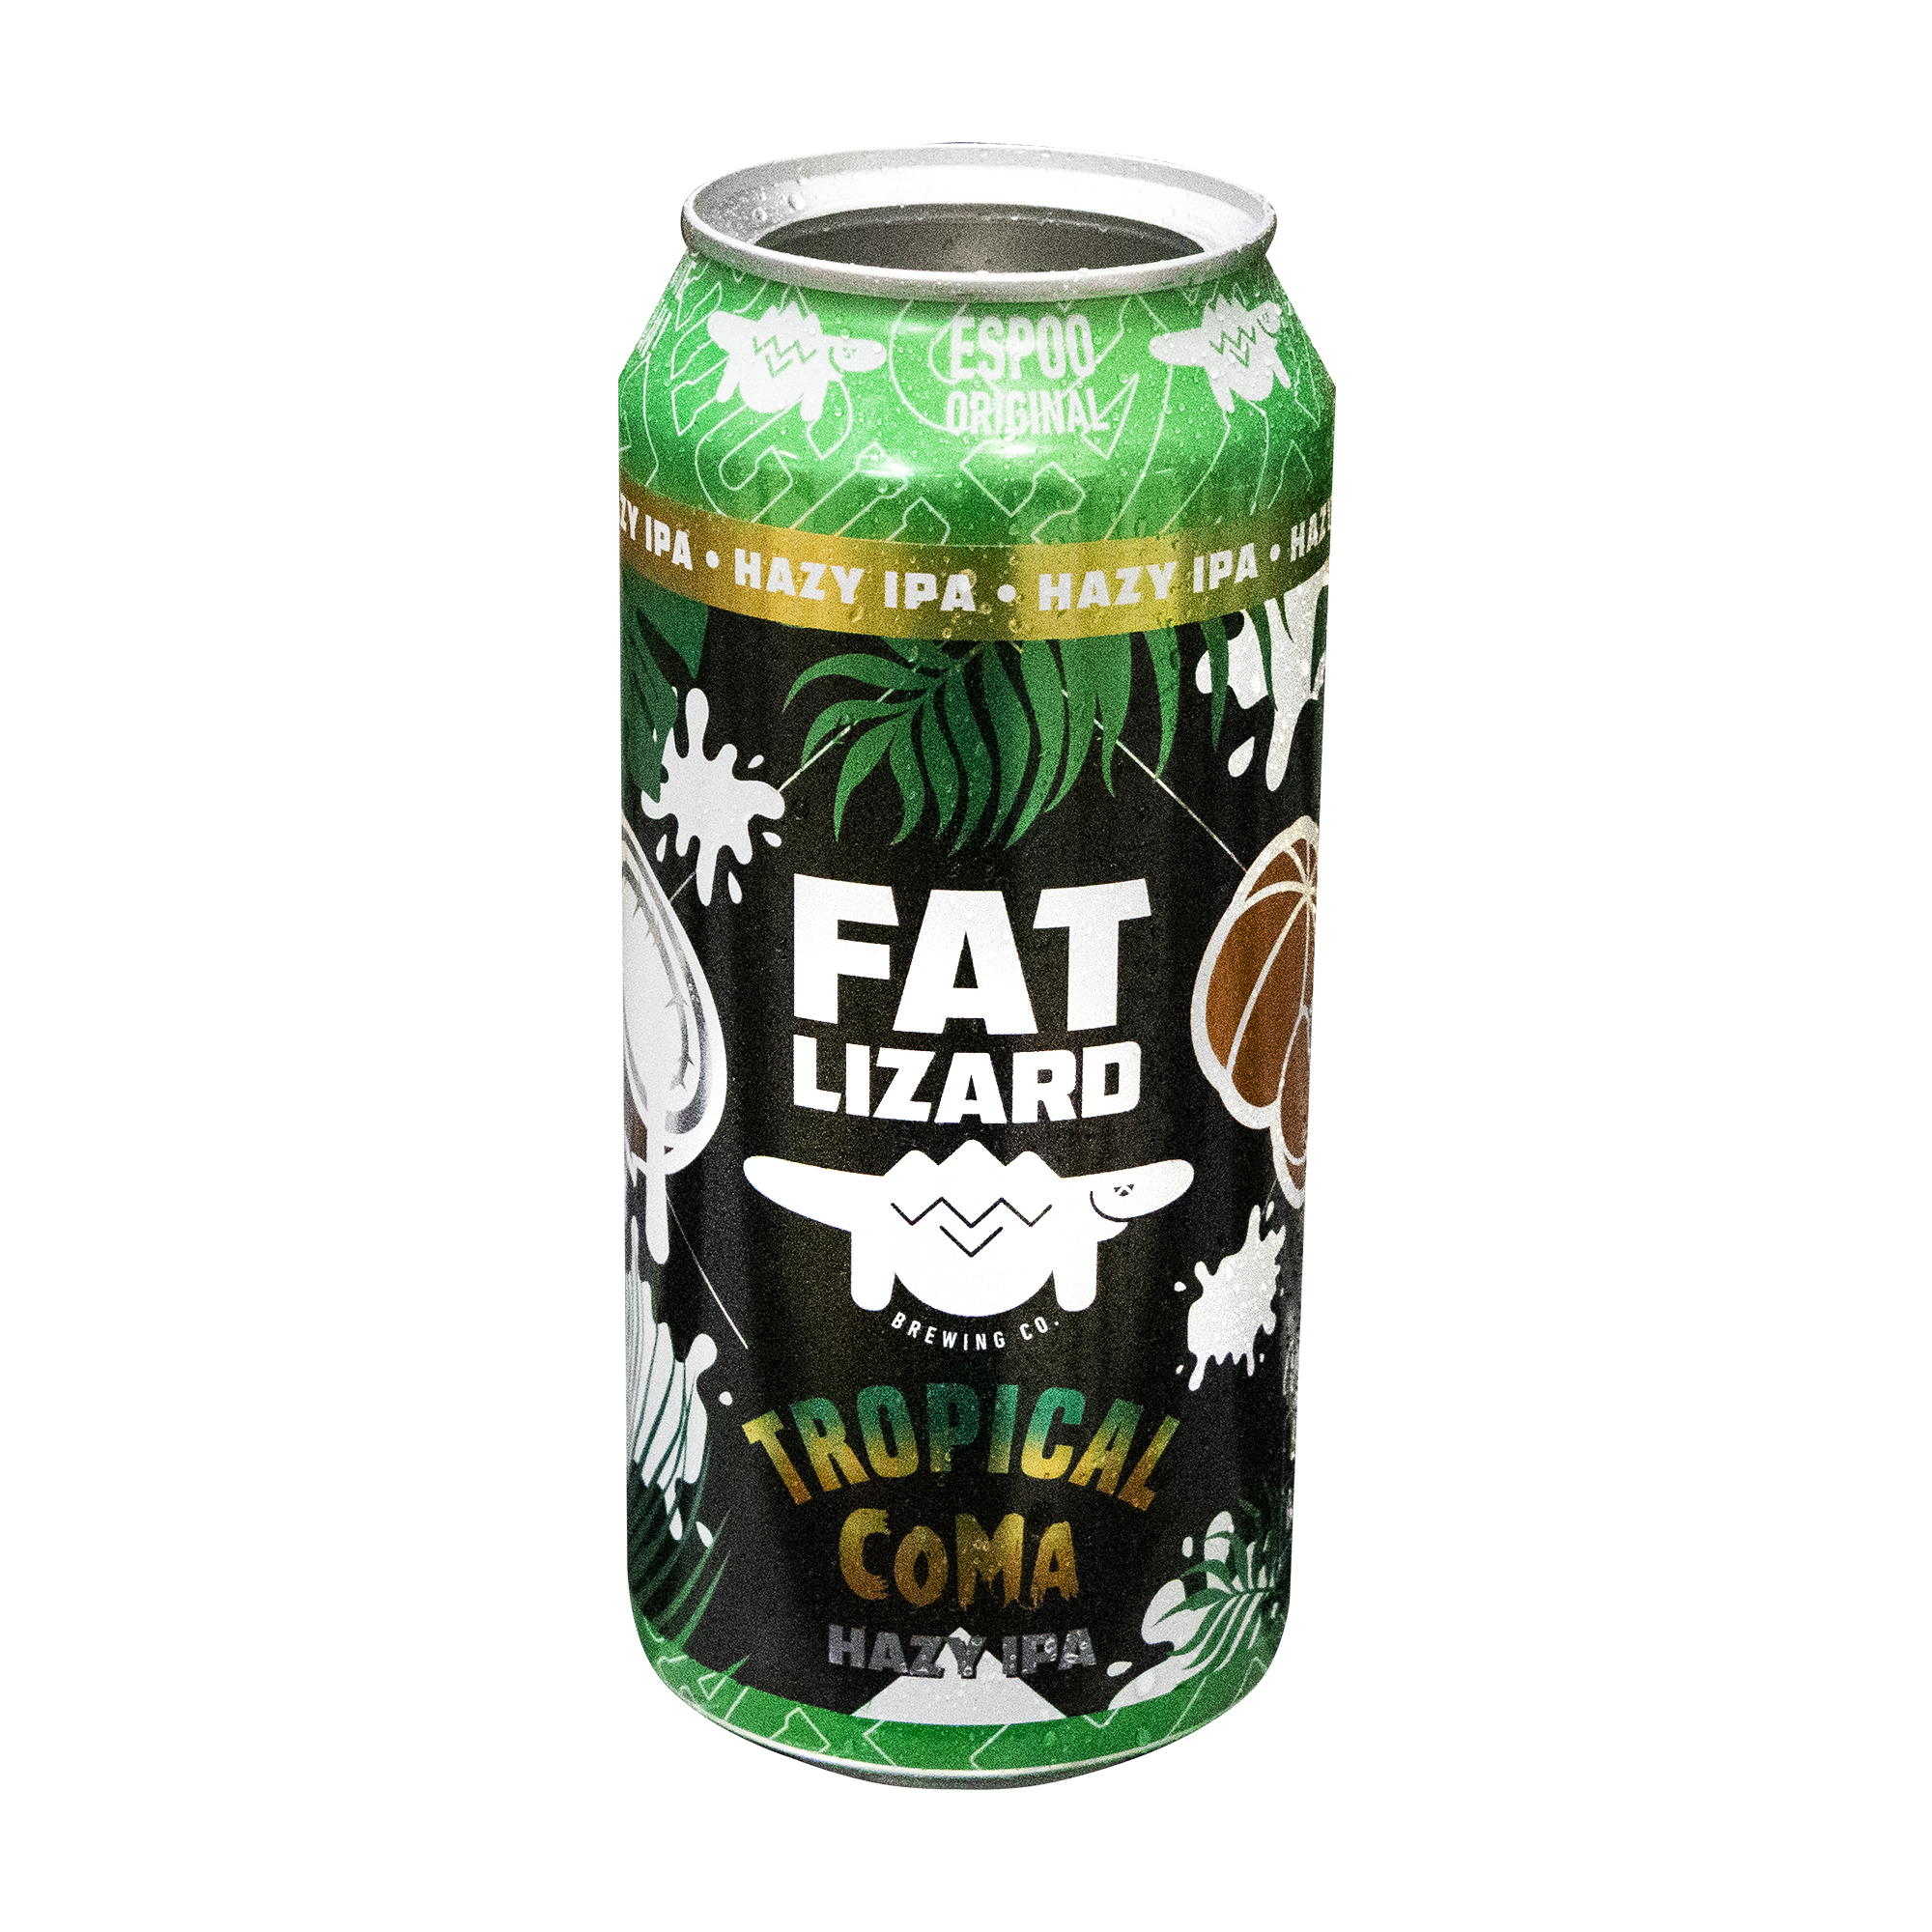 Tropical CoMa Hazy IPA 6,3% - 0,44l can